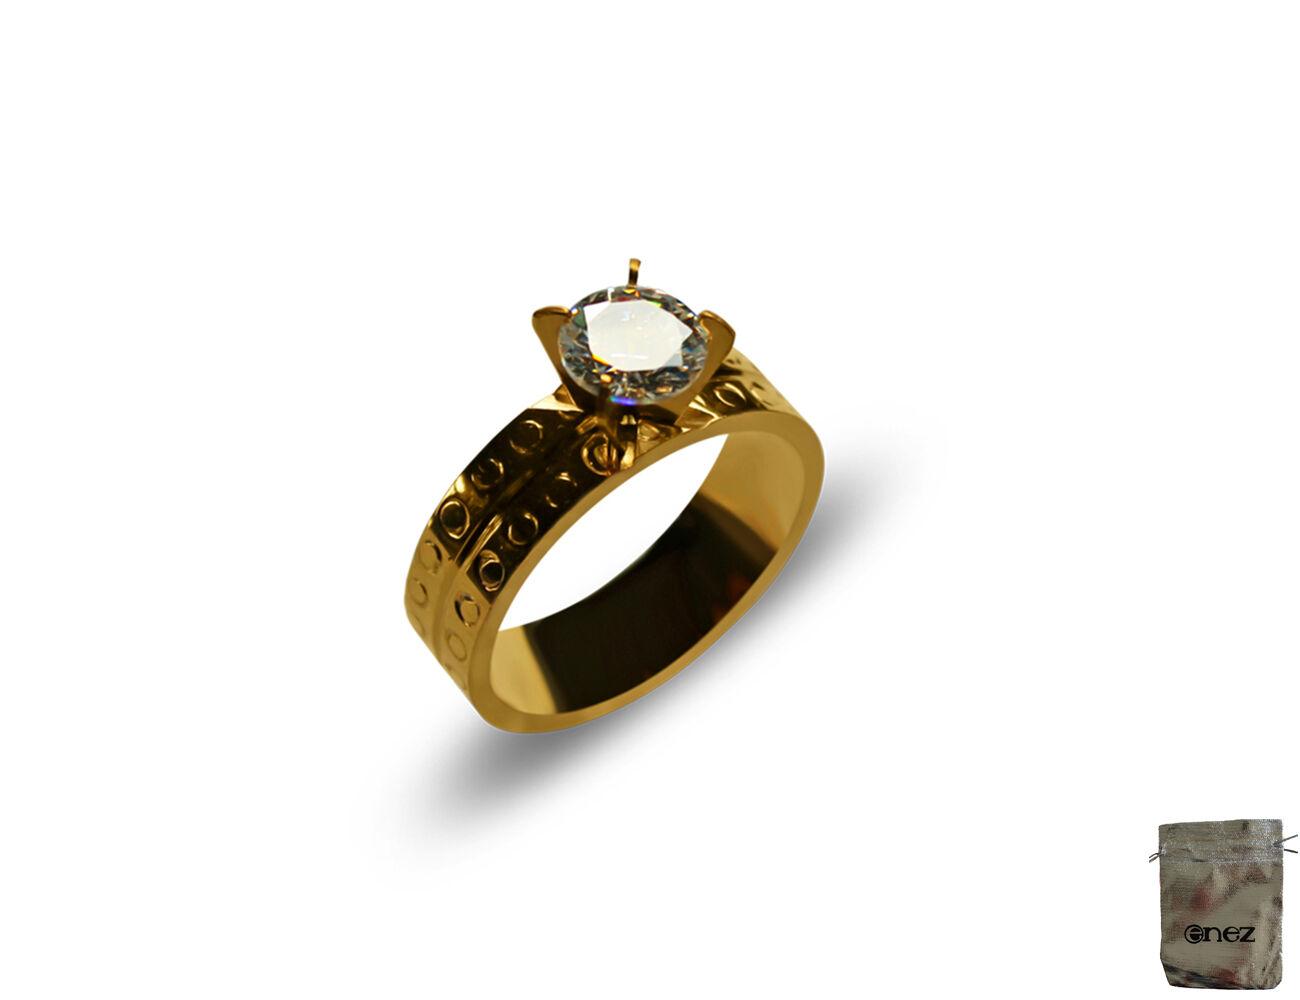 4mm R2709 Original Enez Ring Trauring Ehering Edelstahlring B